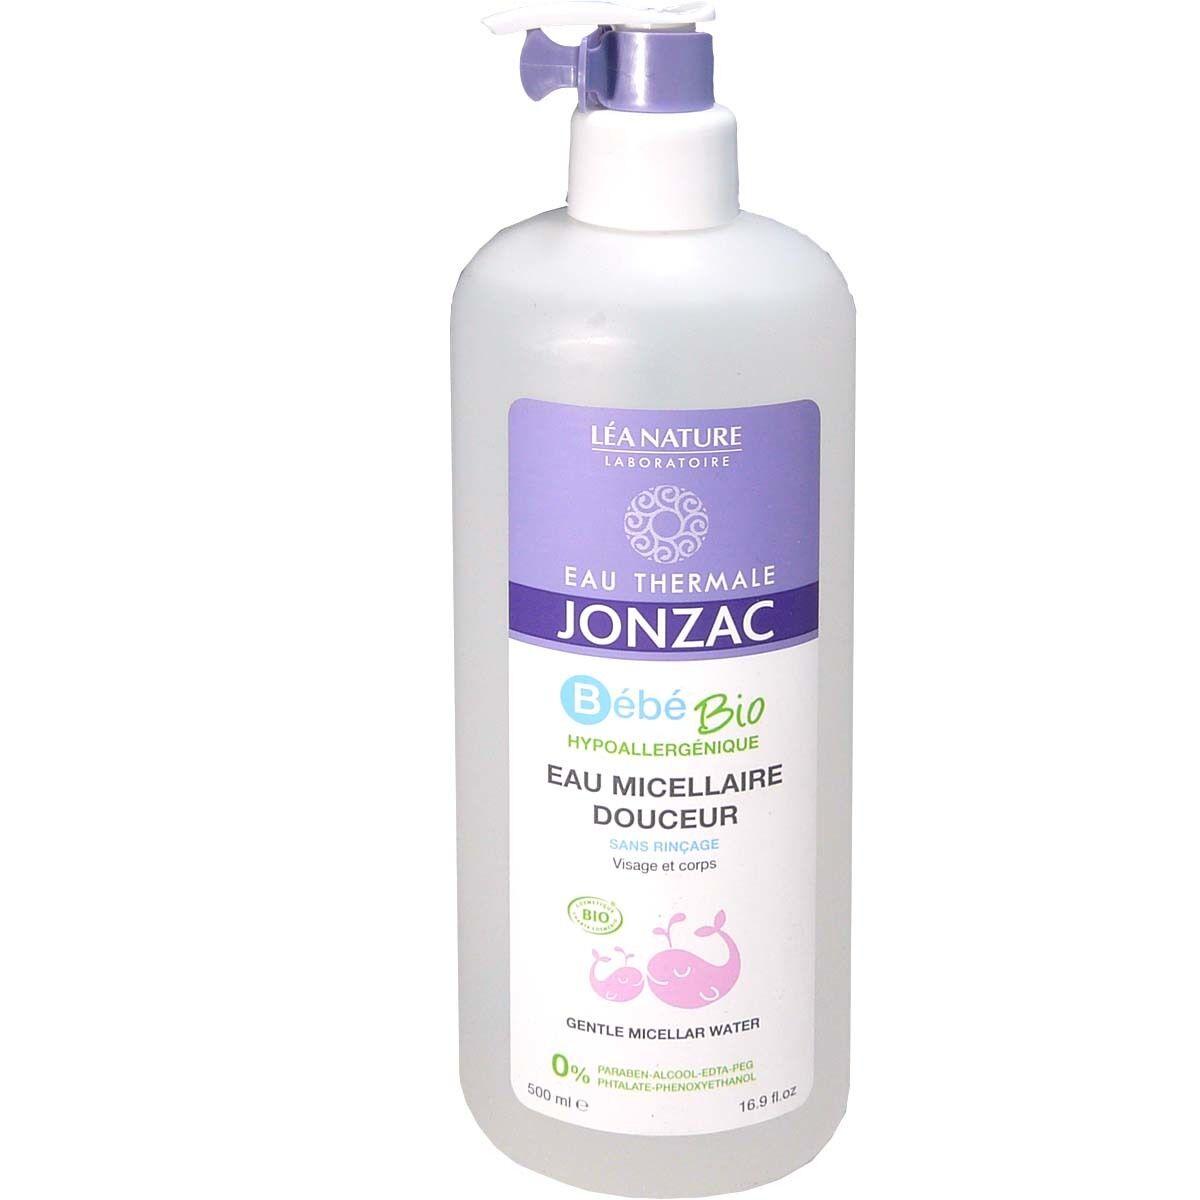 Jonzac bebe bio eau micellaire douceur 500 ml